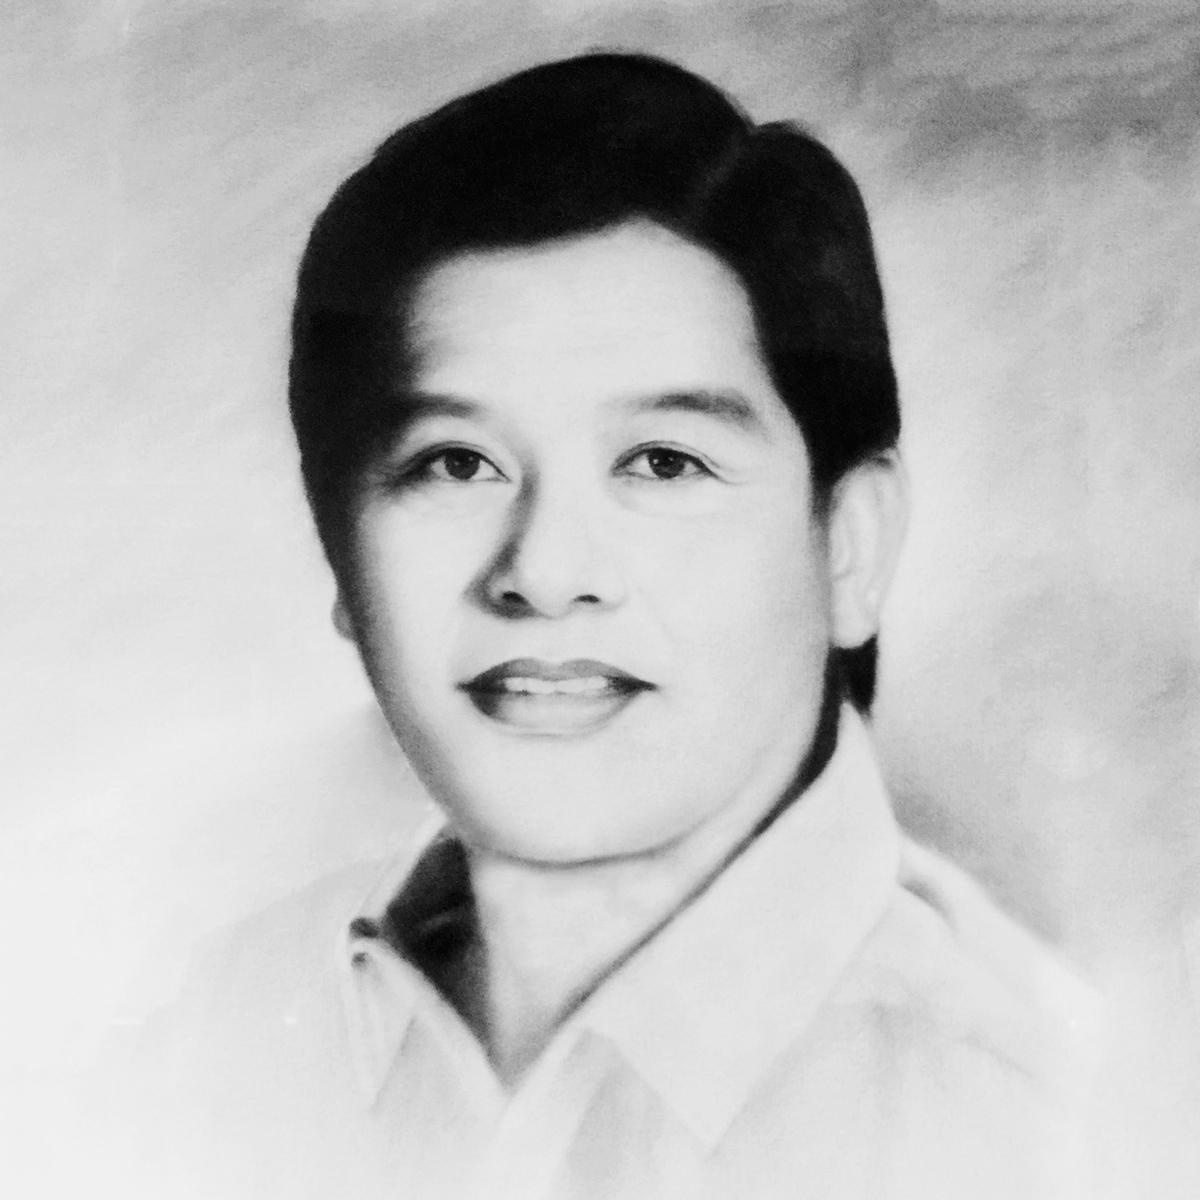 Raul V. Del Mar